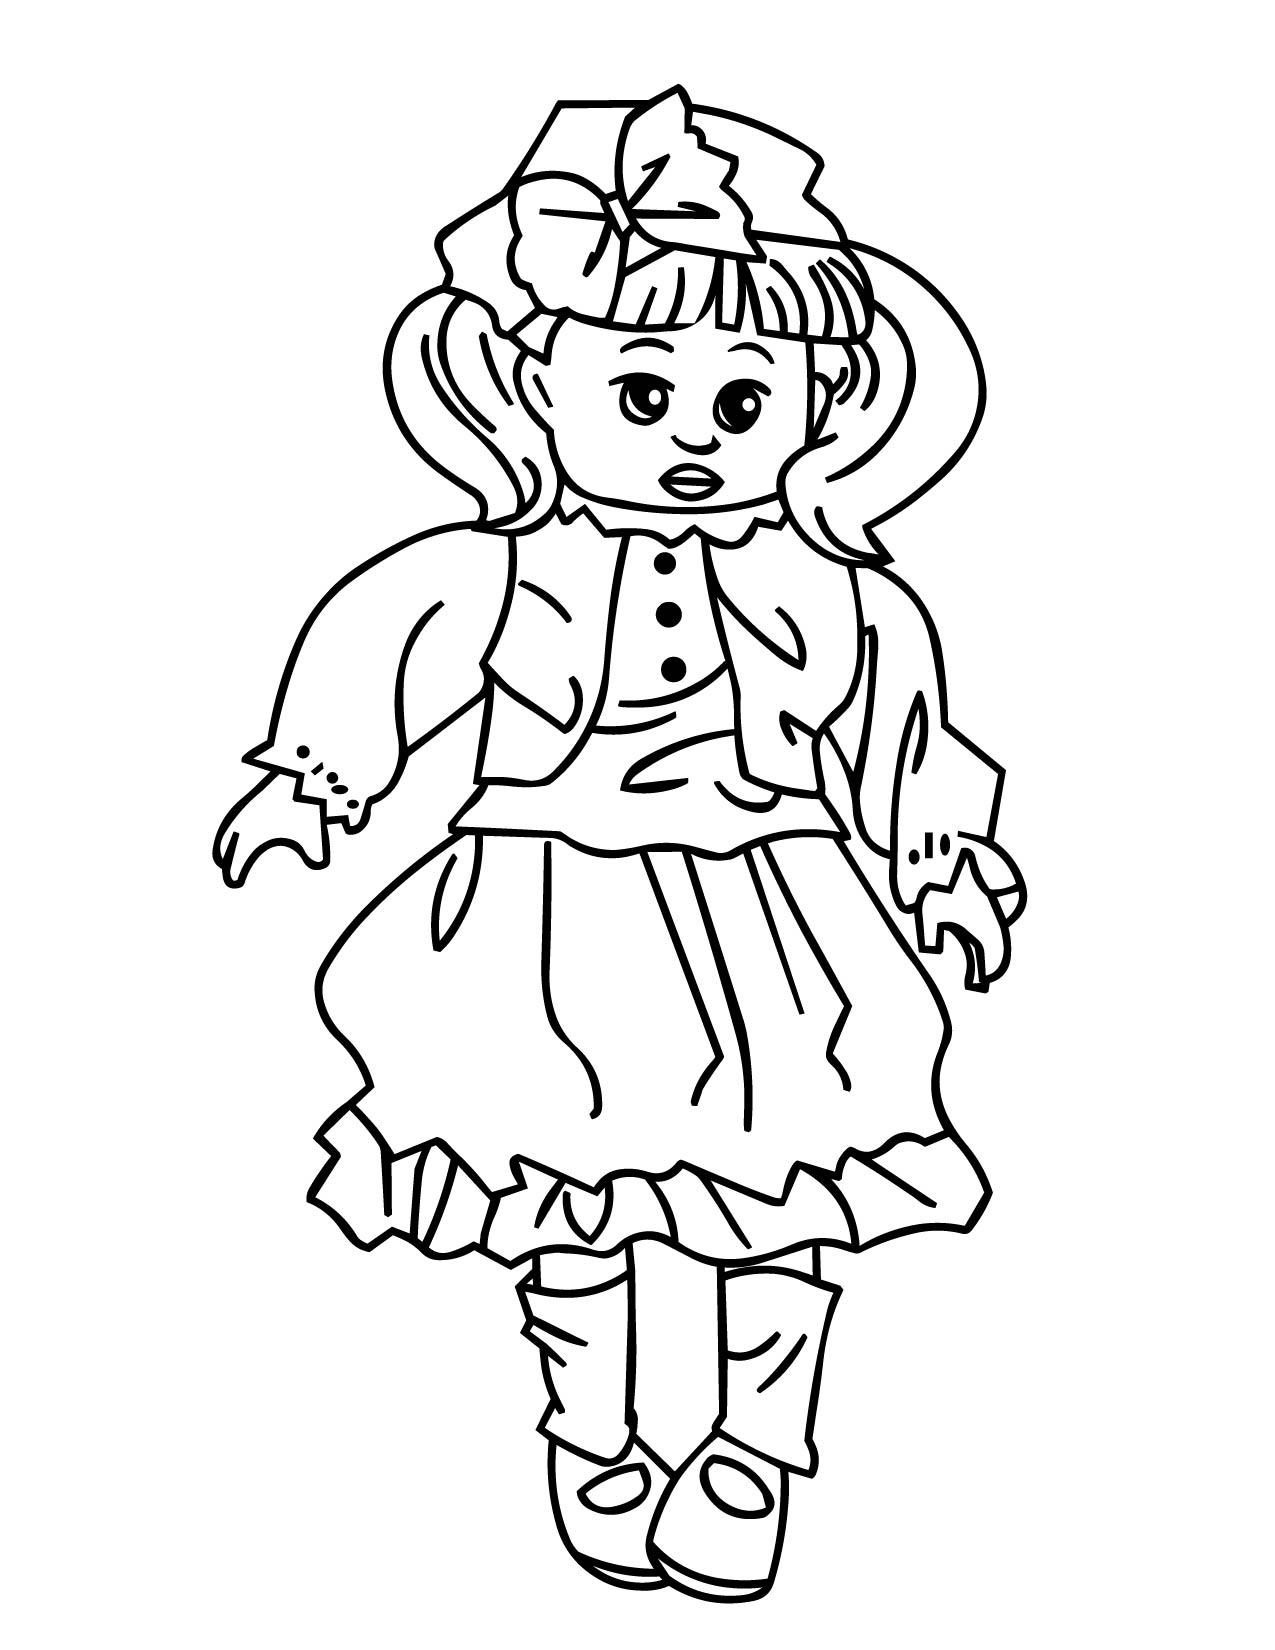 Dall coloring #8, Download drawings